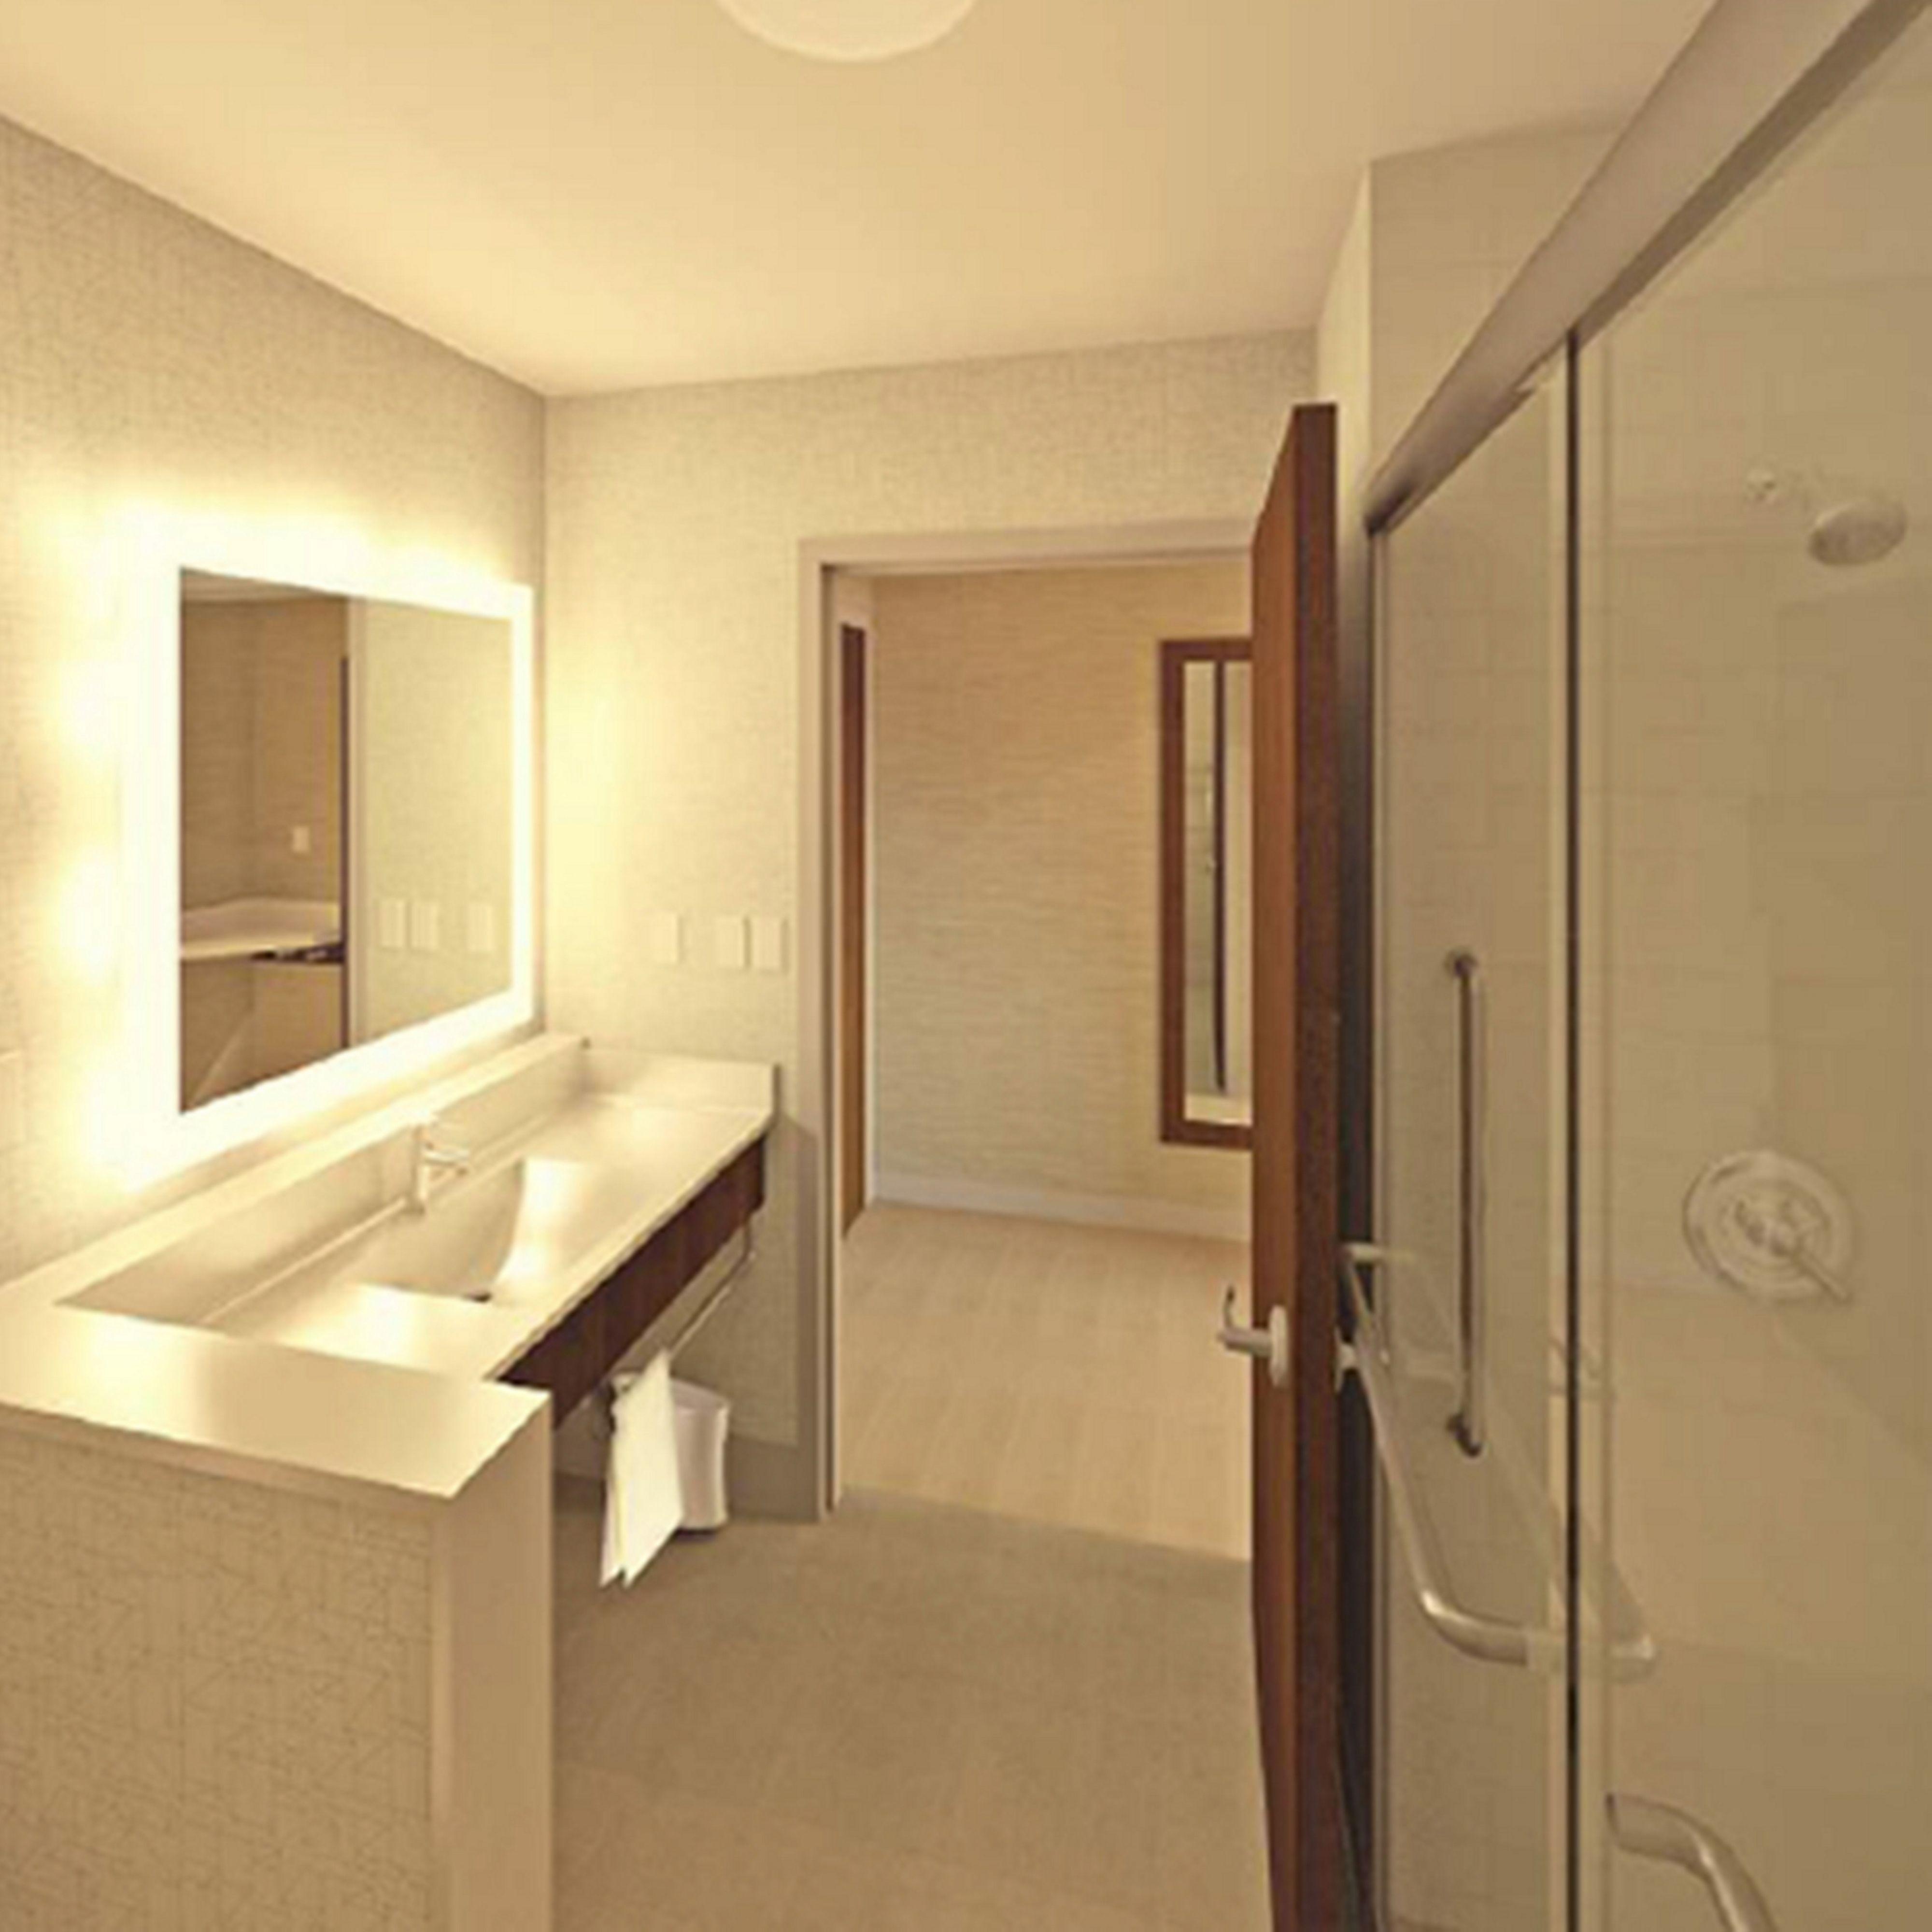 holiday-inn-express-and-suites-eagan-4076444569-original.jpg